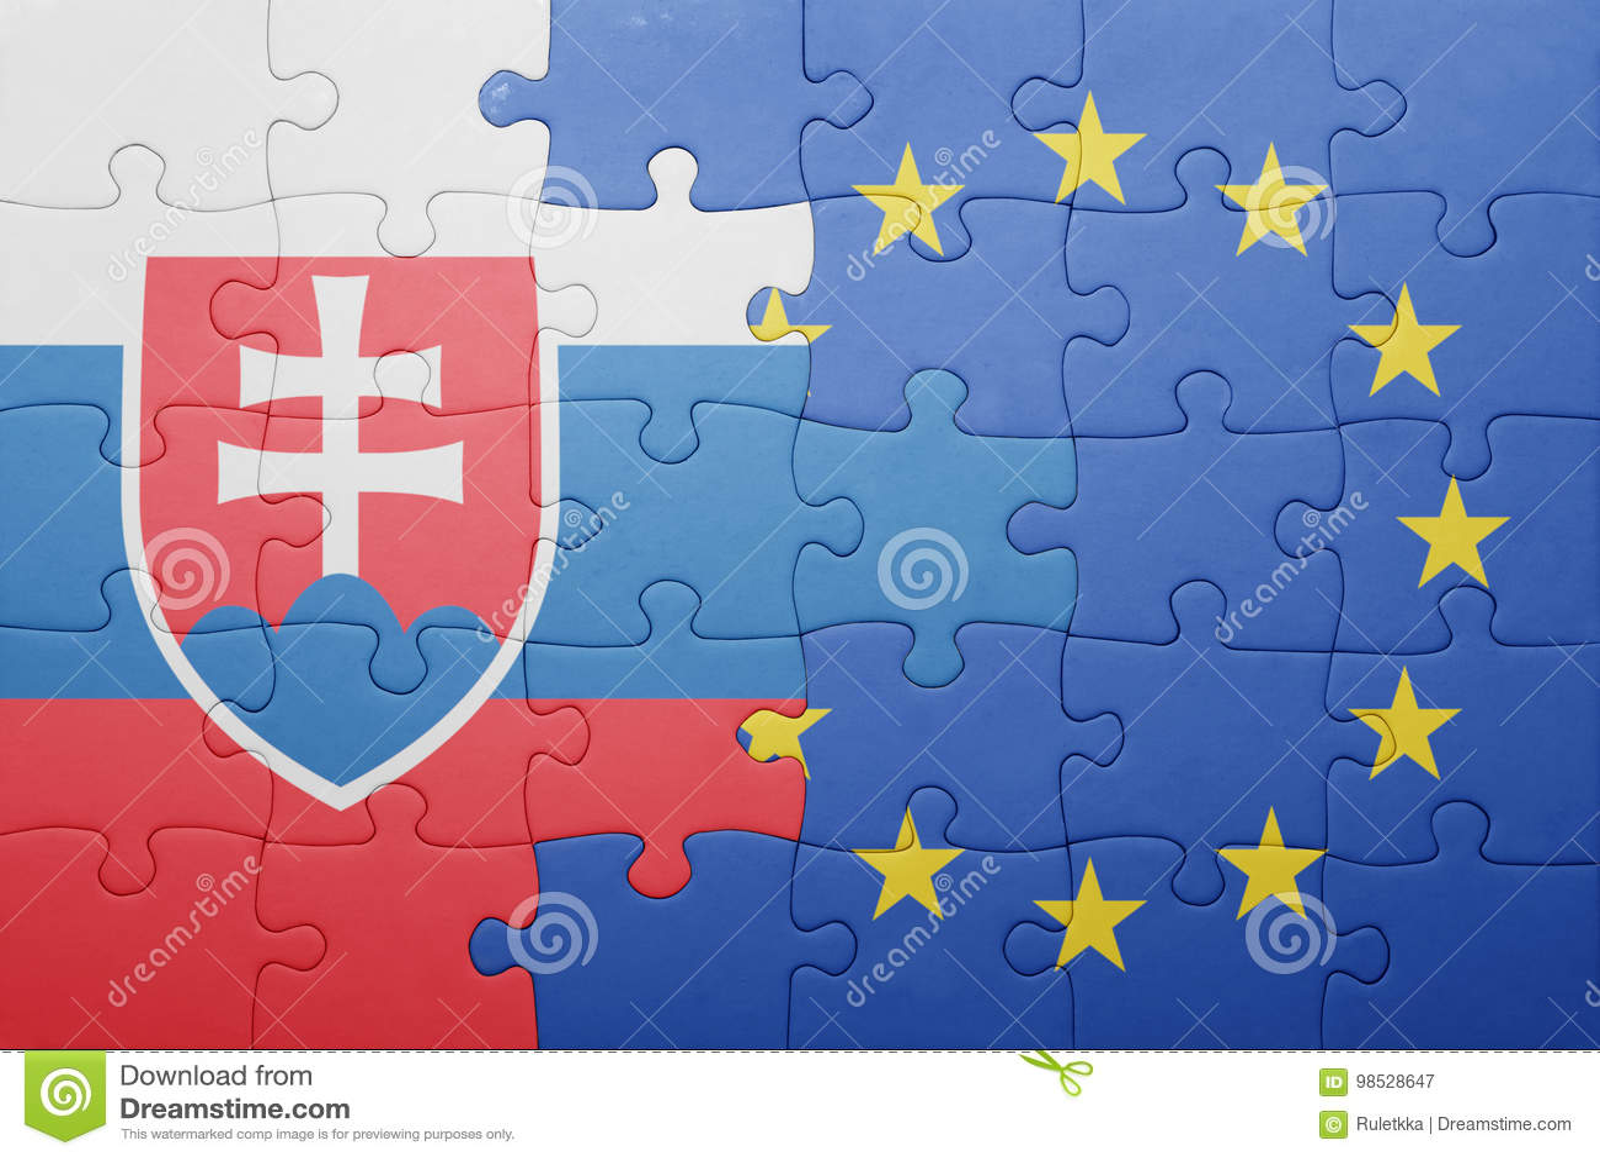 55ecc39e9f Puzzle With The National Flag Of Slovakia And European Union Stock ...